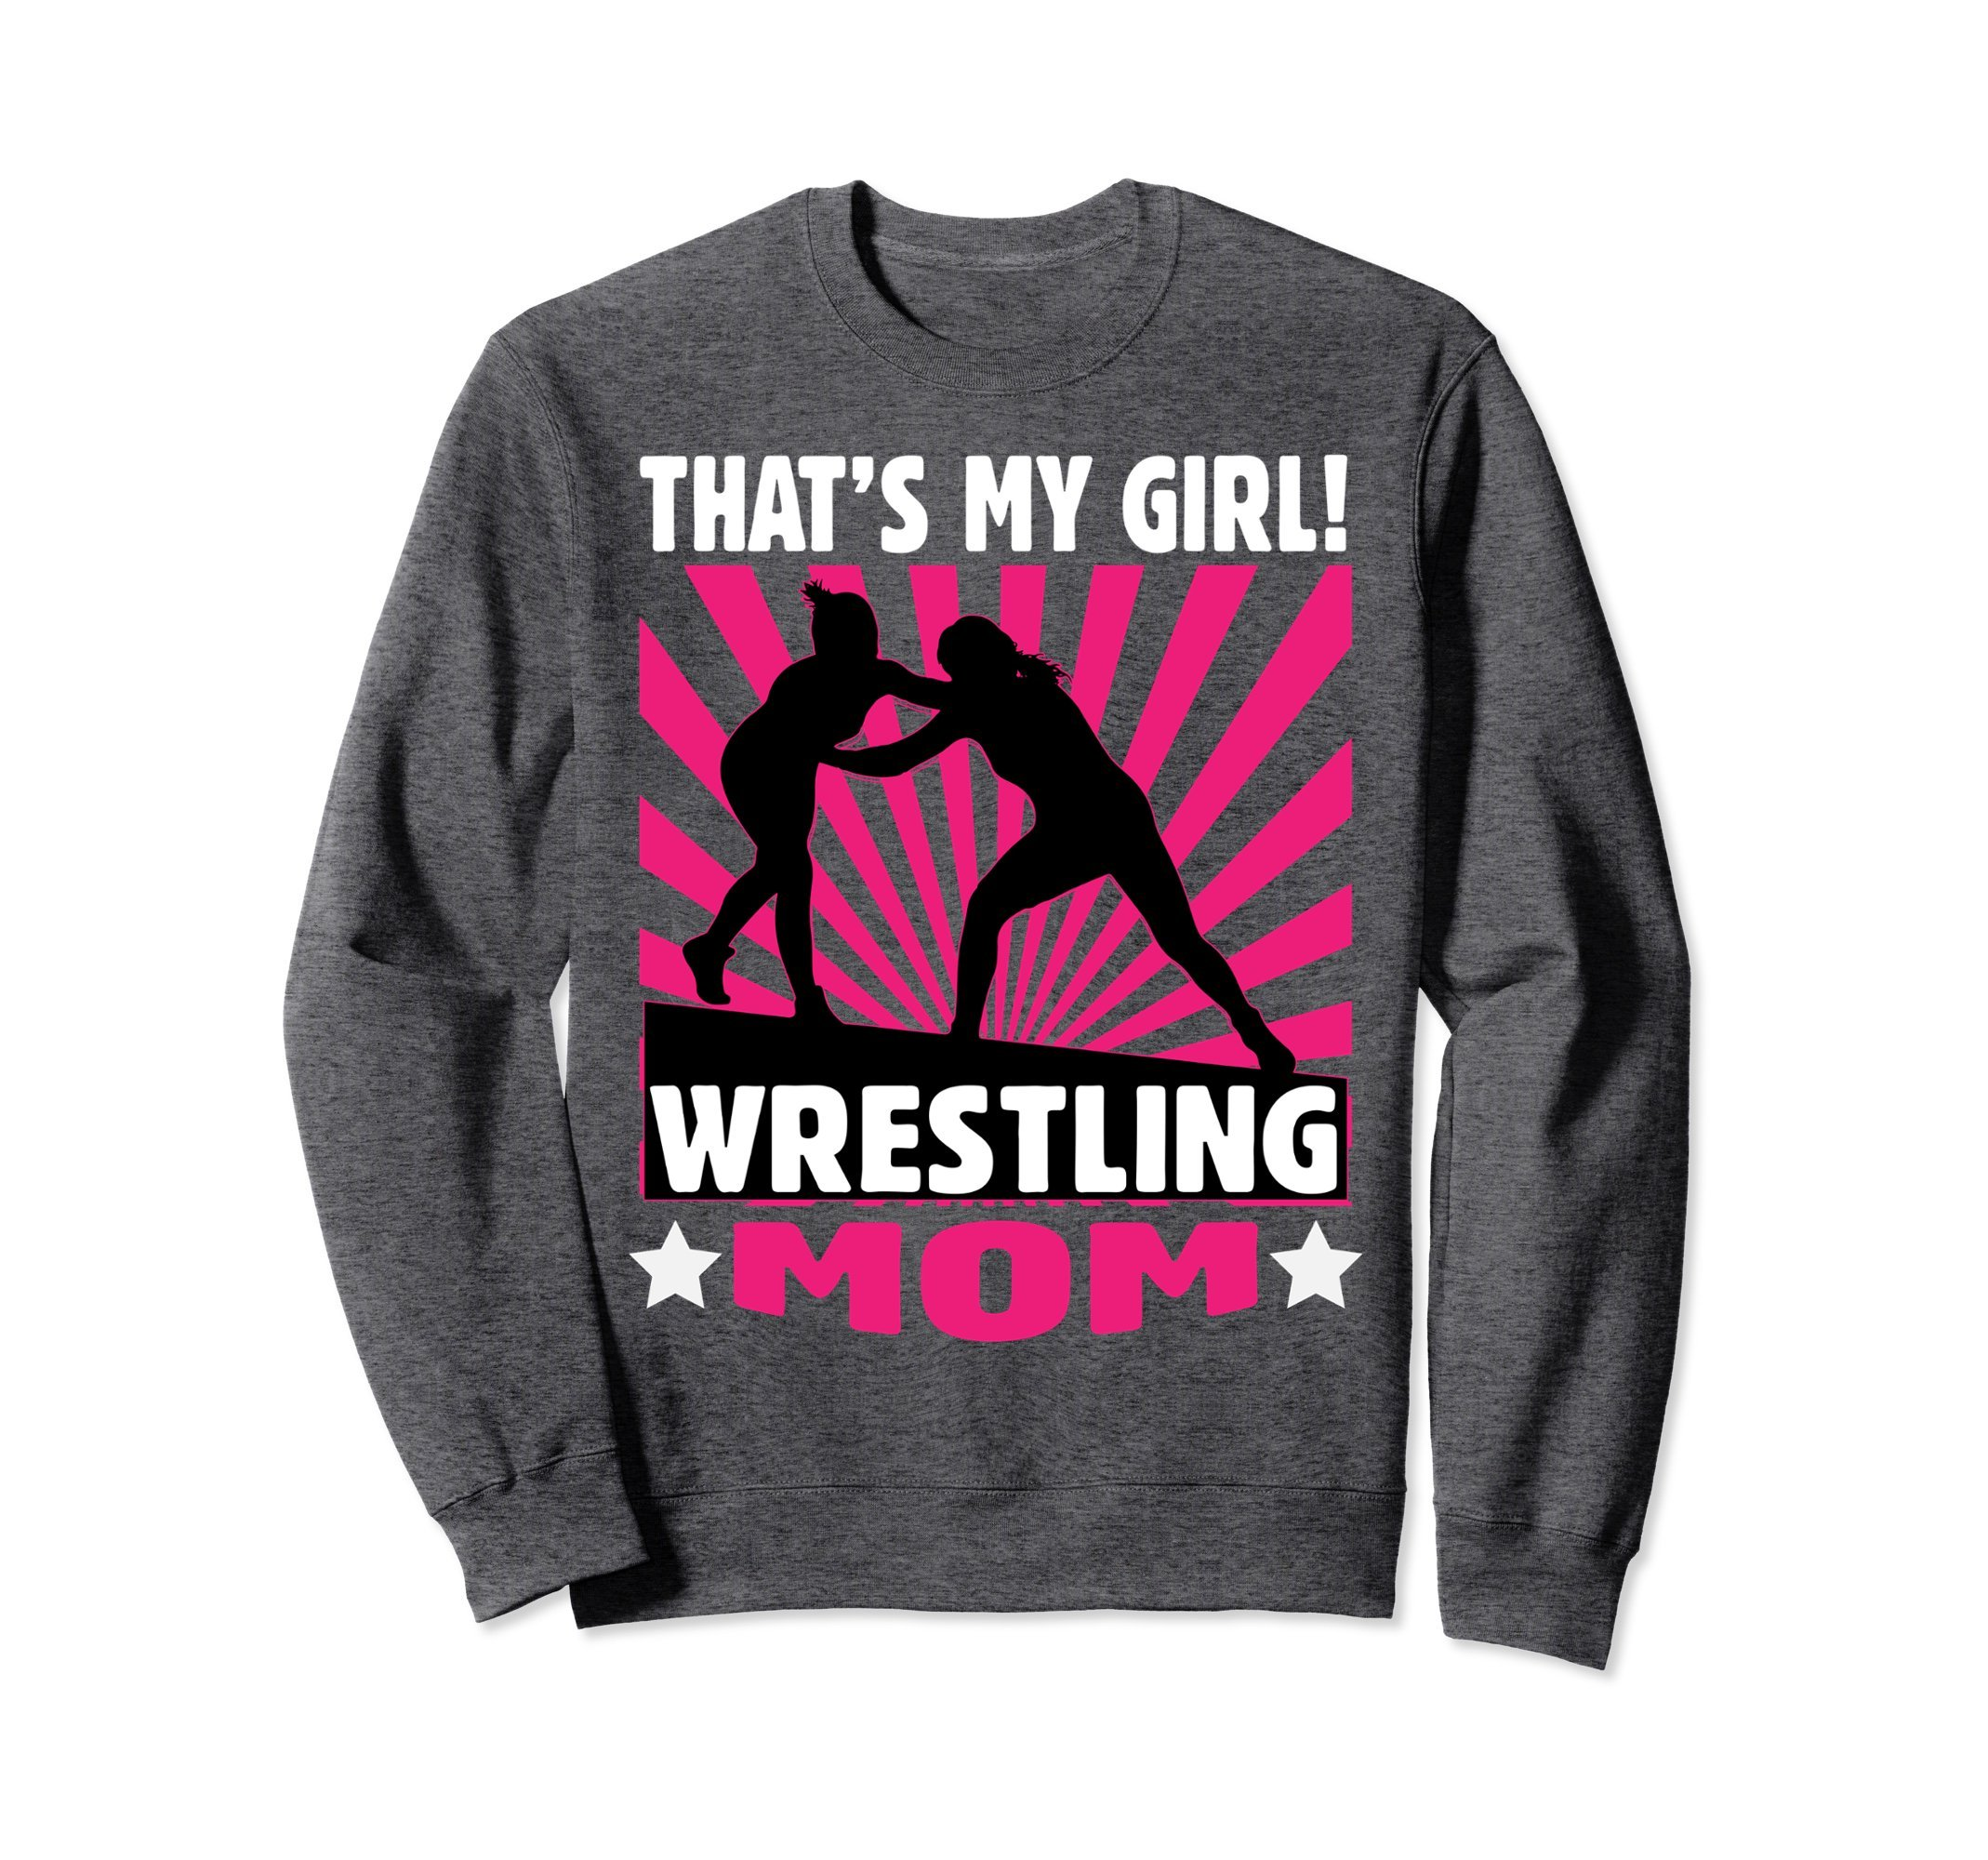 Unisex Wrestling Sweatshirt - Girls Wrestling Mom Sweater Medium Dark Heather